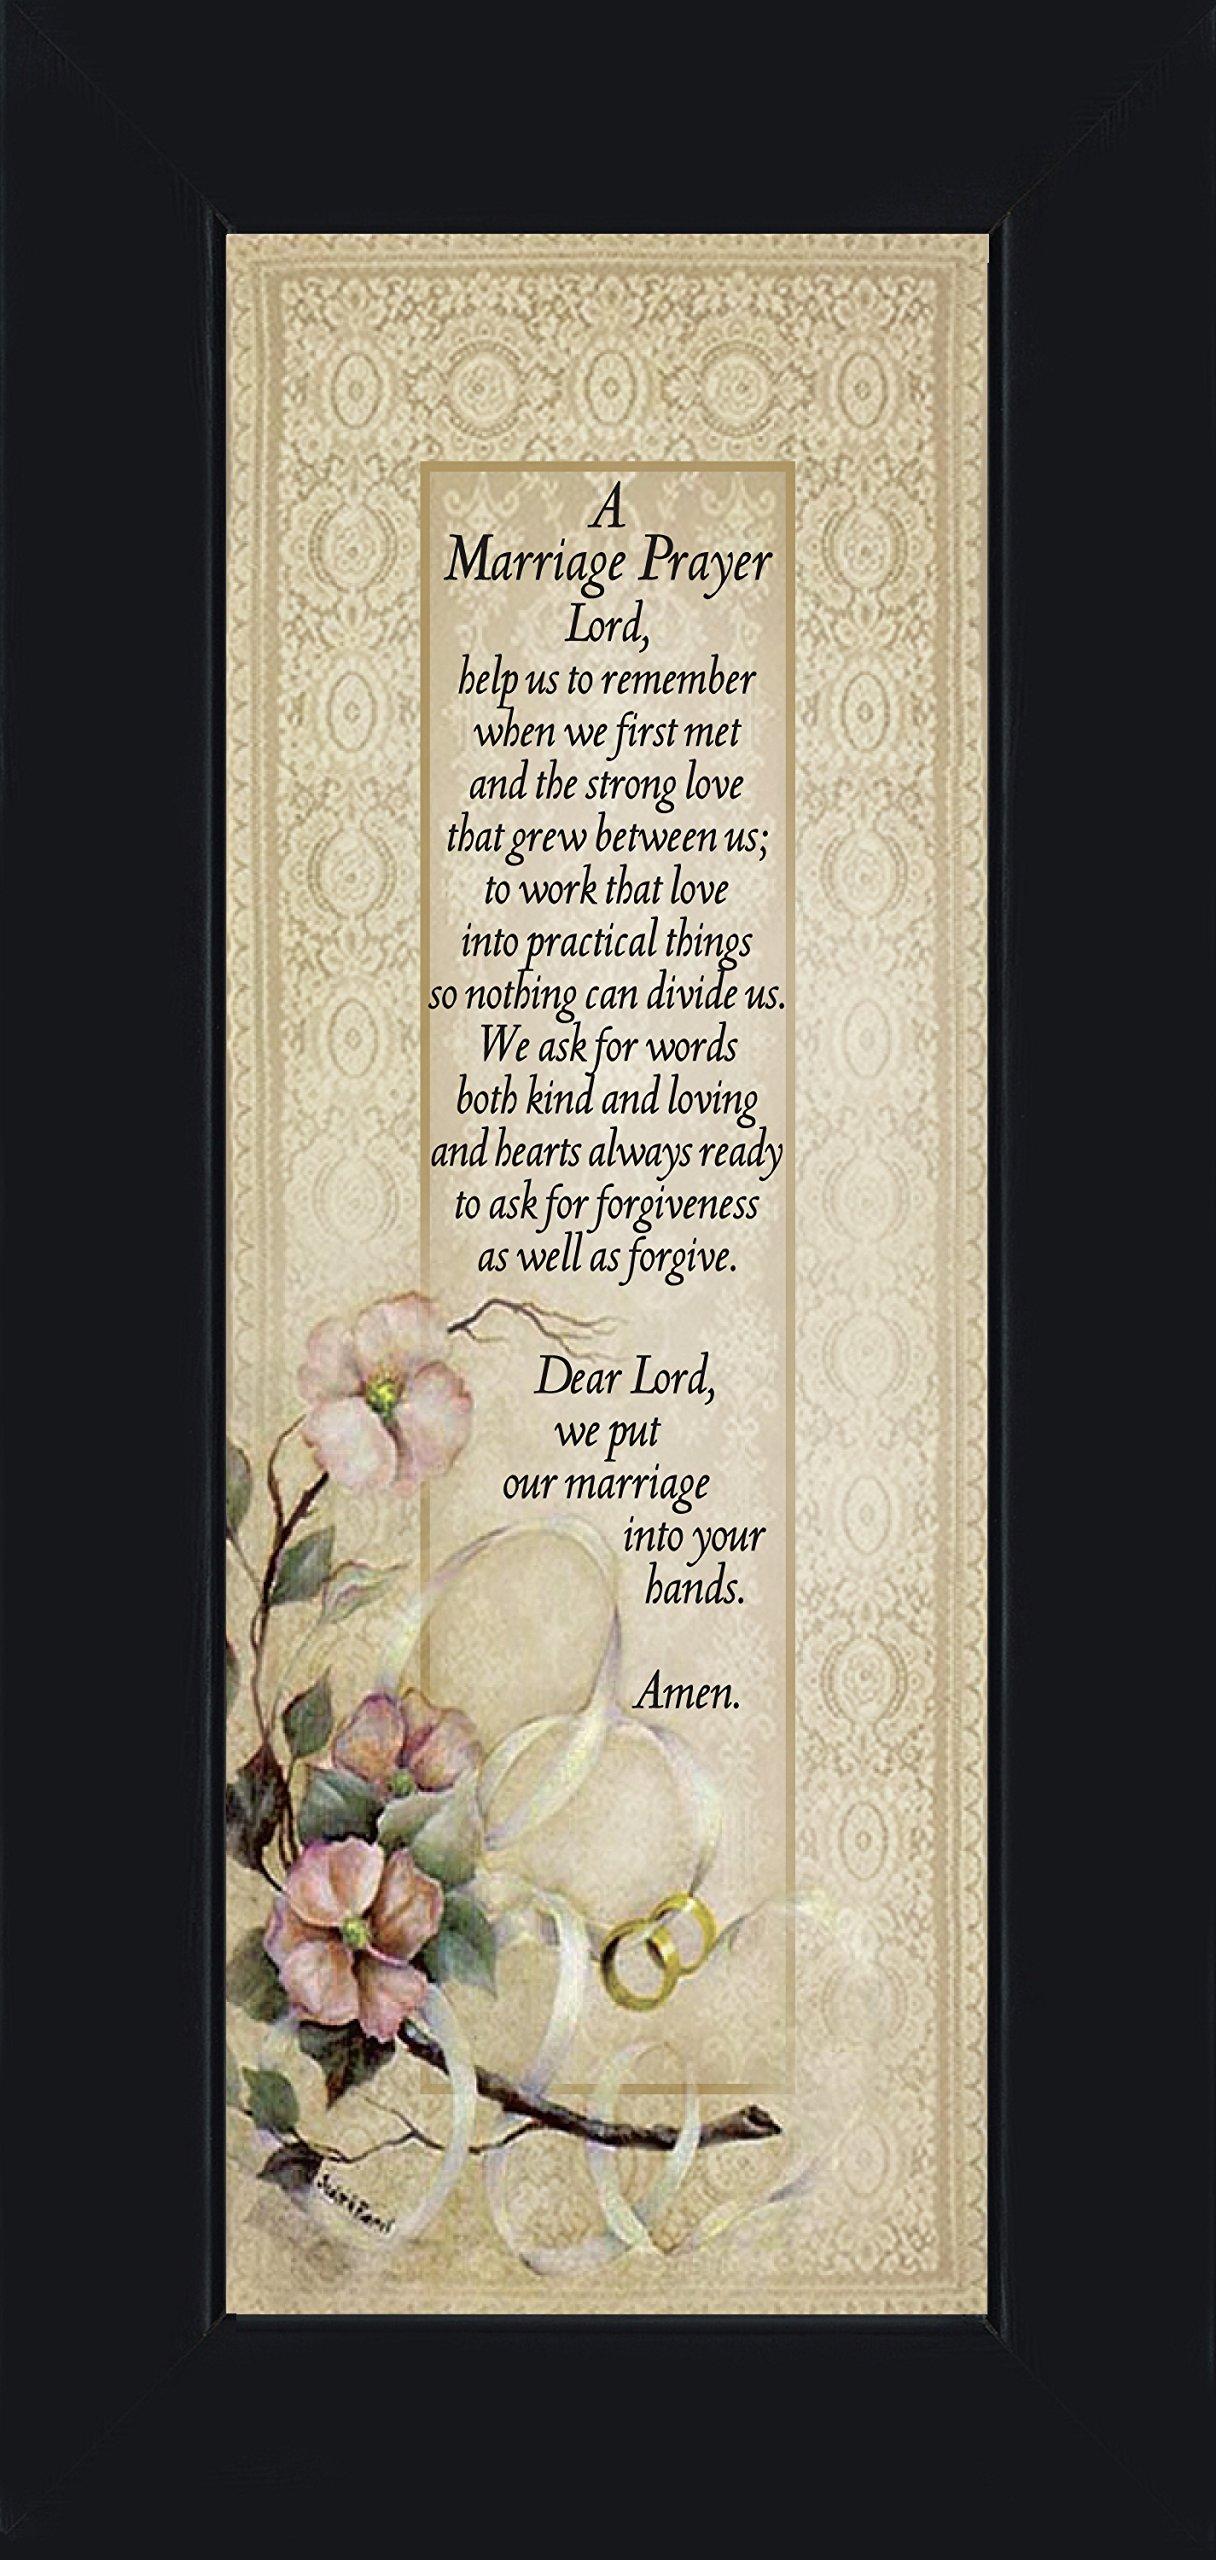 Marriage Prayer, Christian Marriage Gift, Frame Wedding Gift, 6x12 7757BC